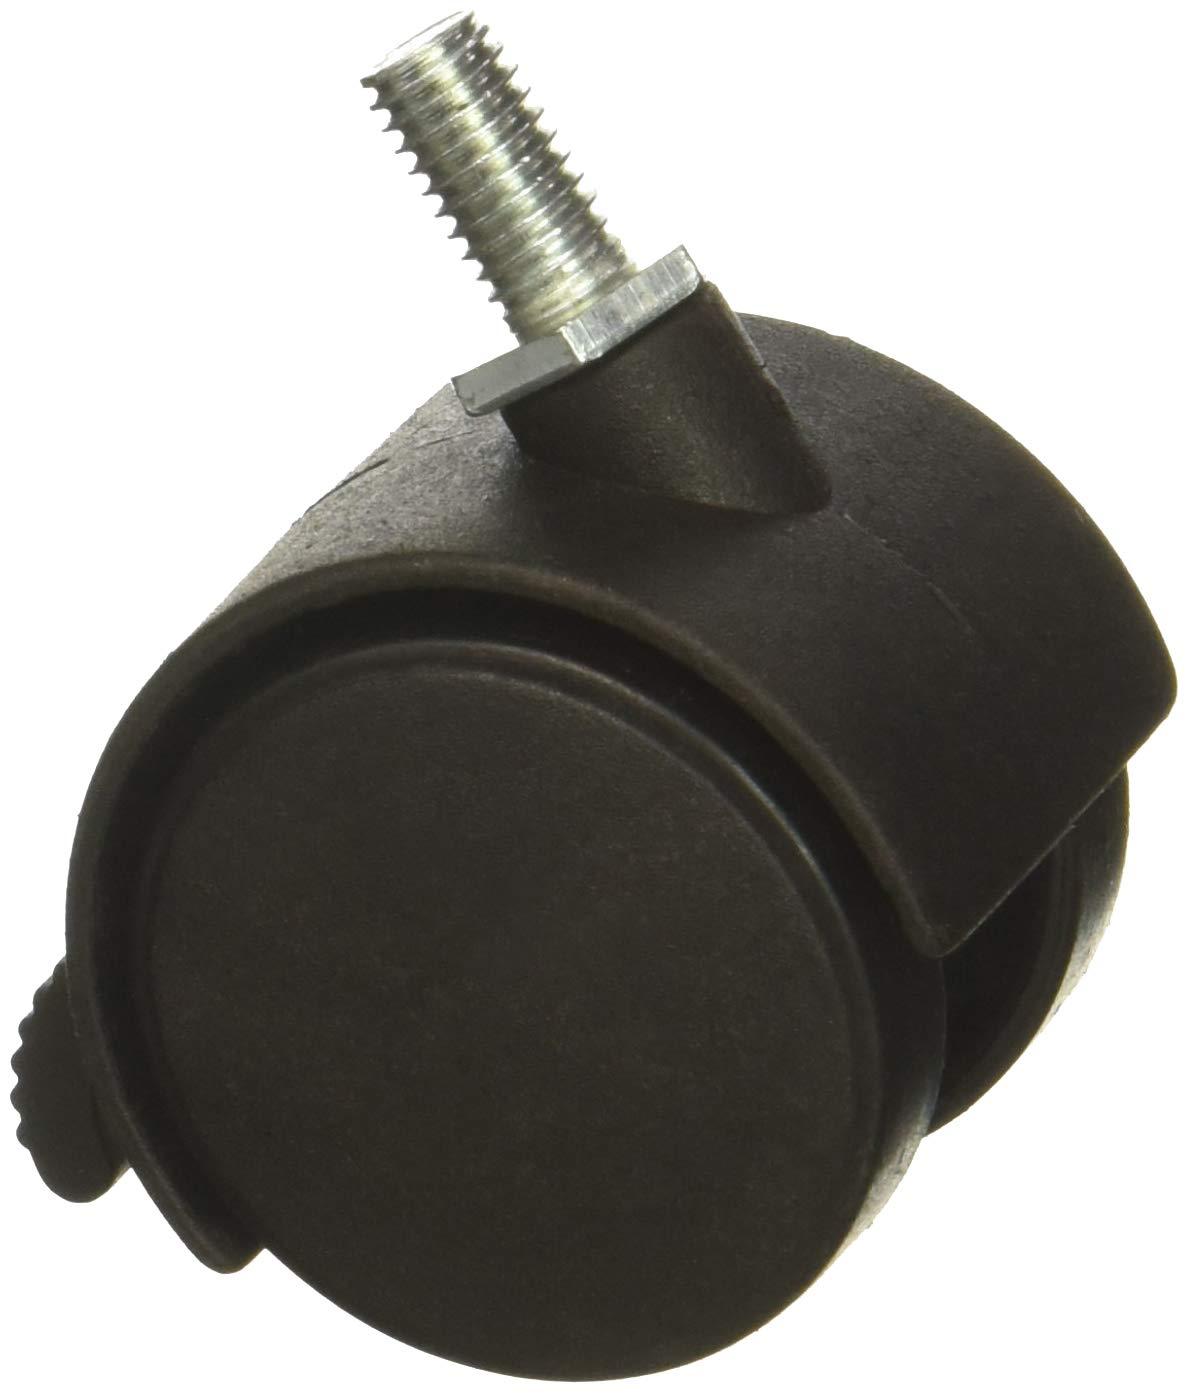 Uxcell a15042400ux0069 1.5 Twin Wheel 5//16 Threaded Stem Brake Swivel Nylon Casters 3pcs